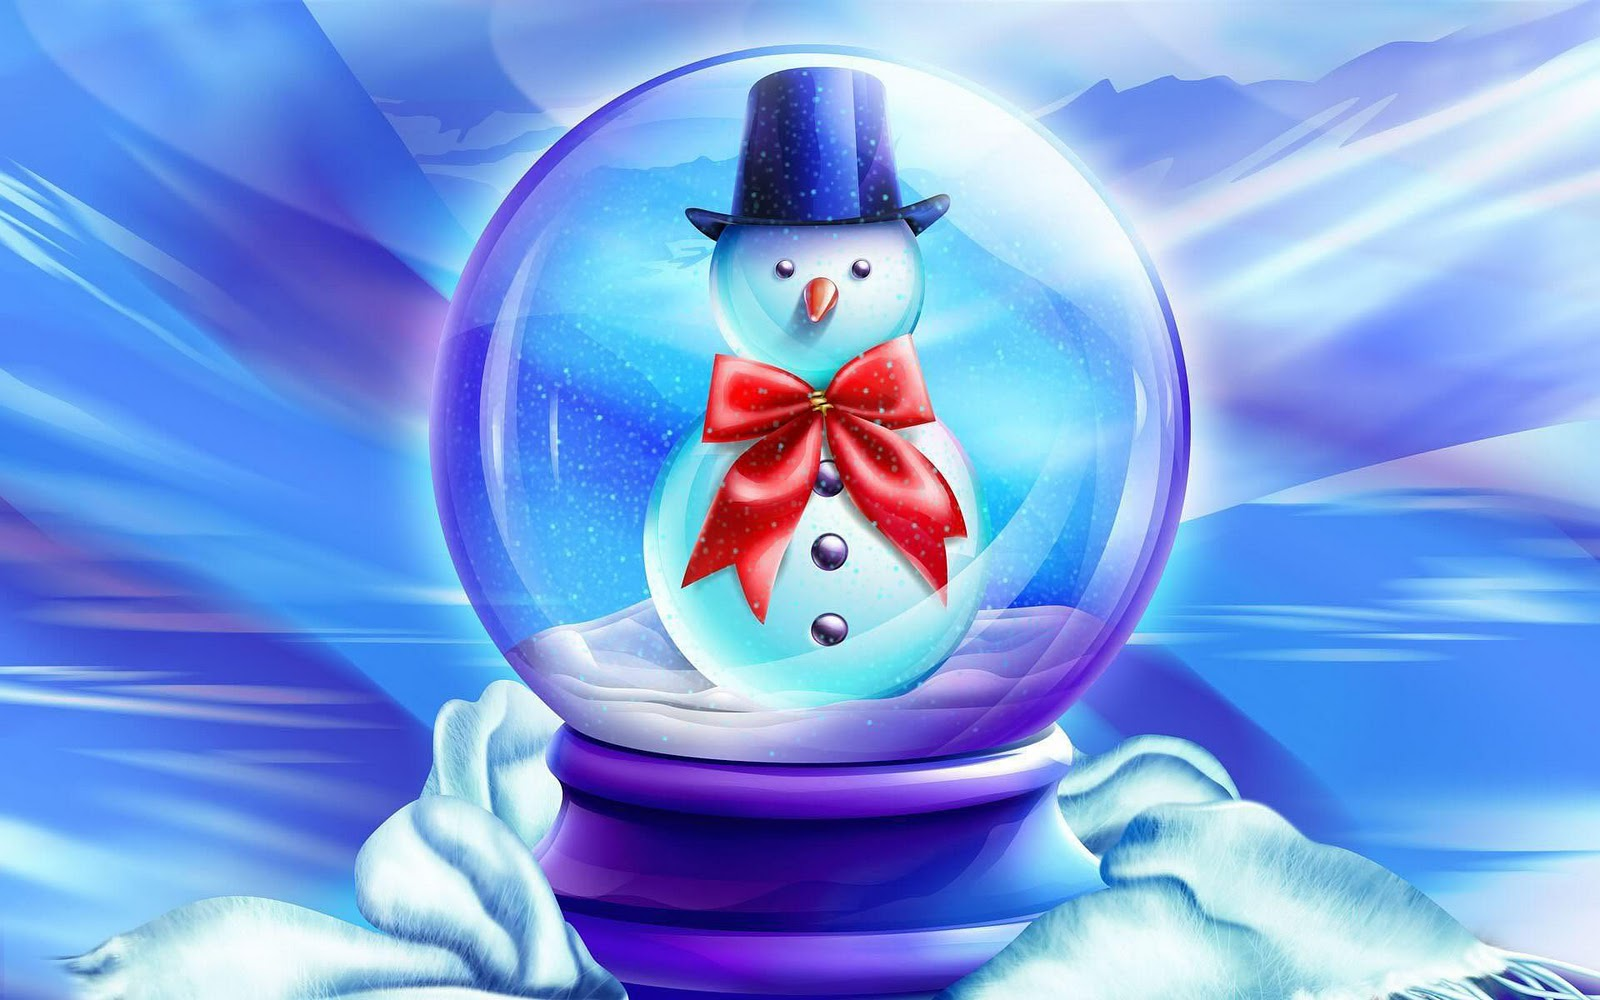 Sneeuwpop Wallpapers | HD Wallpapers